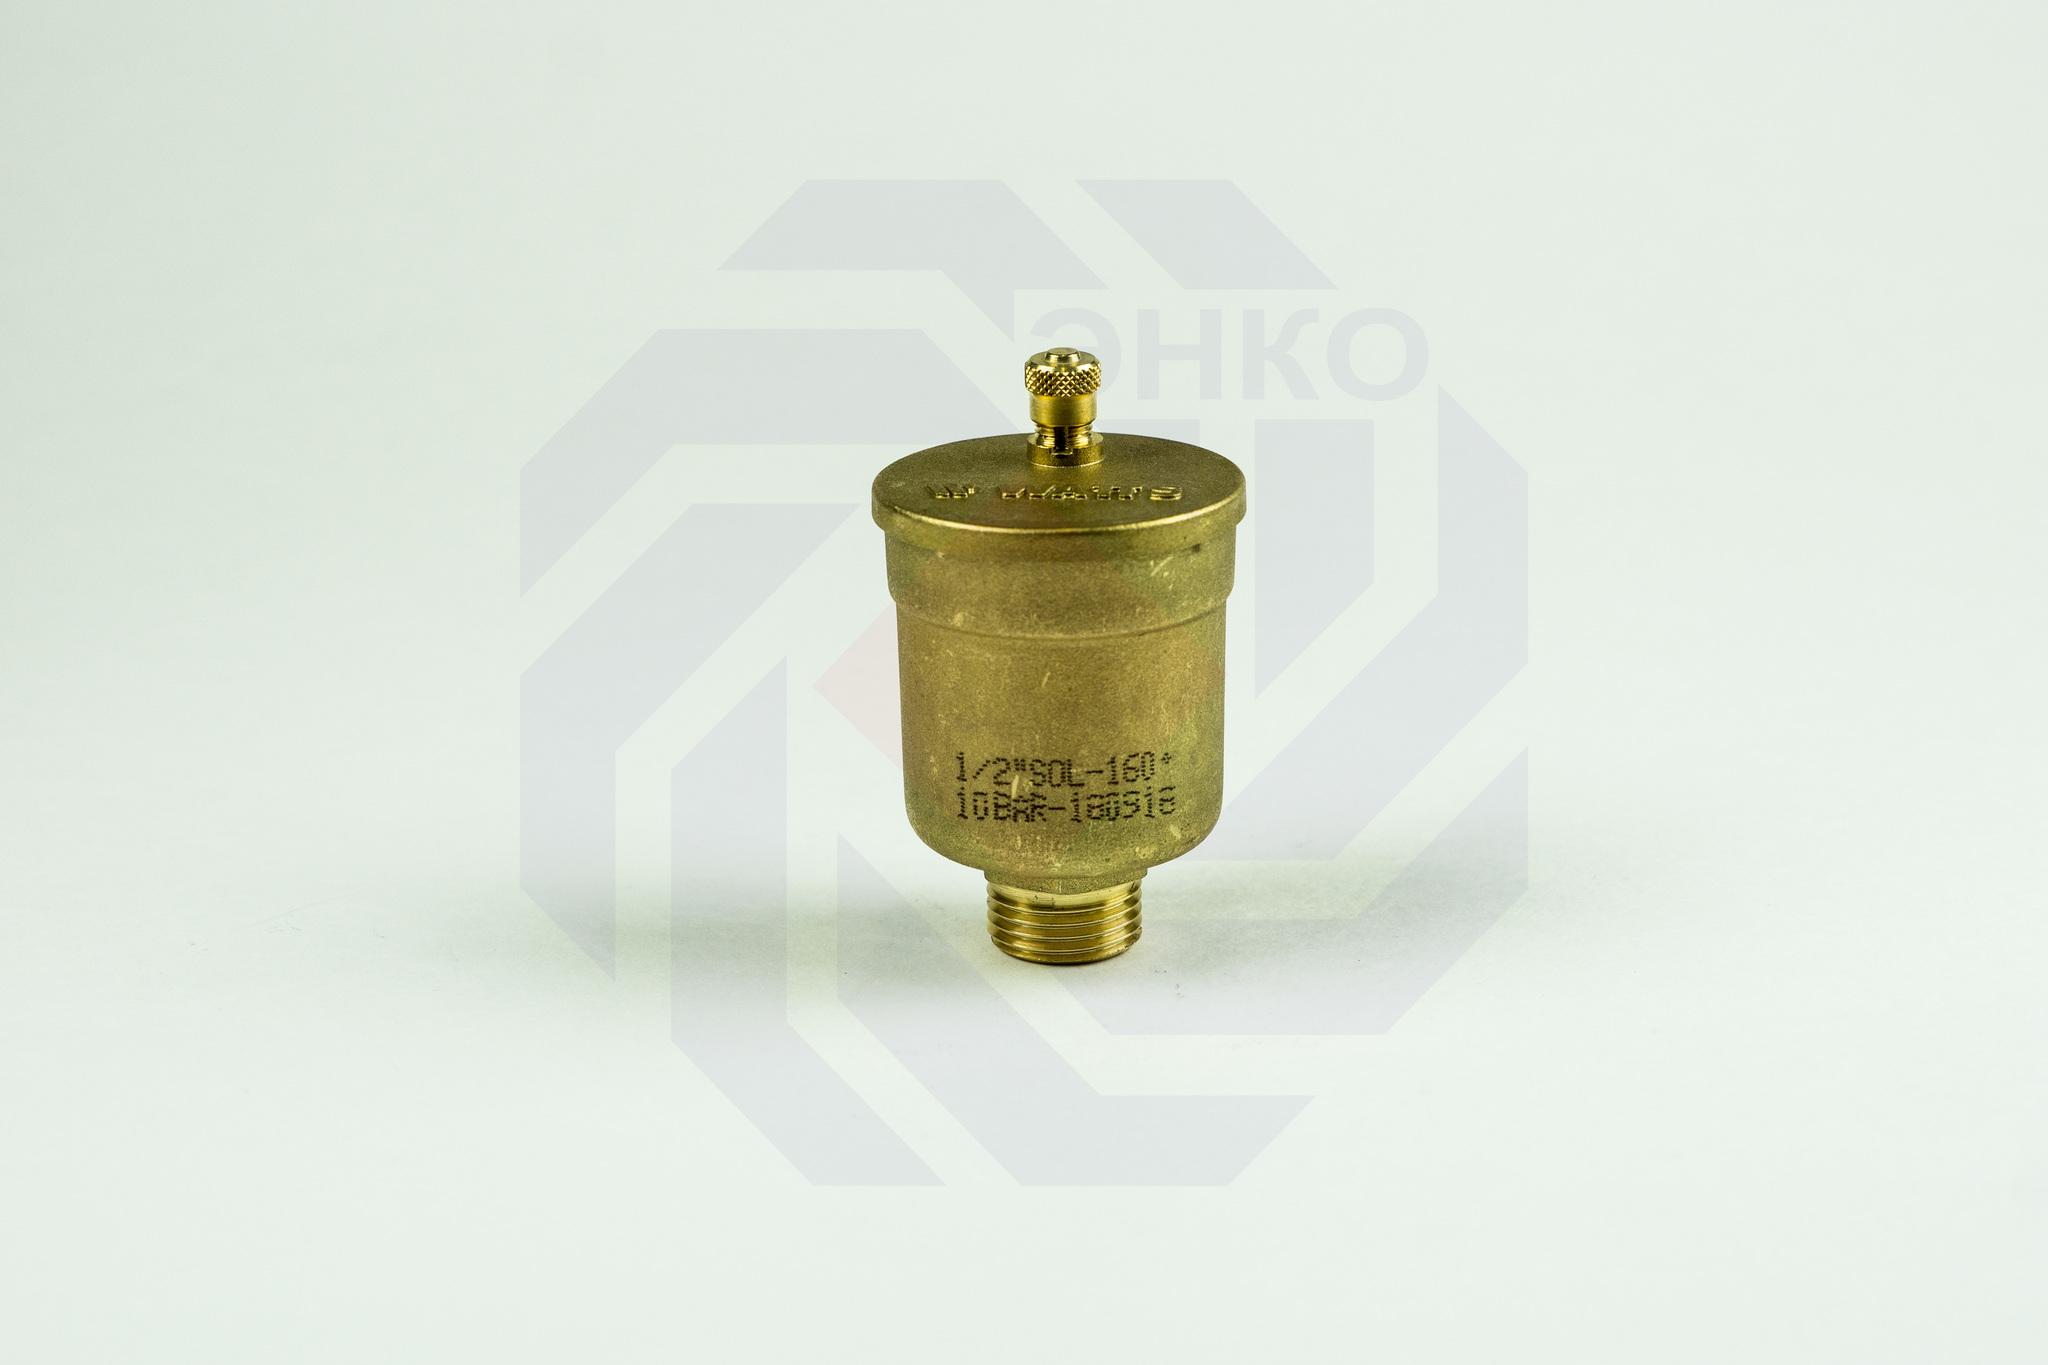 Клапан сброса воздуха автоматический WATTS MV-SOL  ½